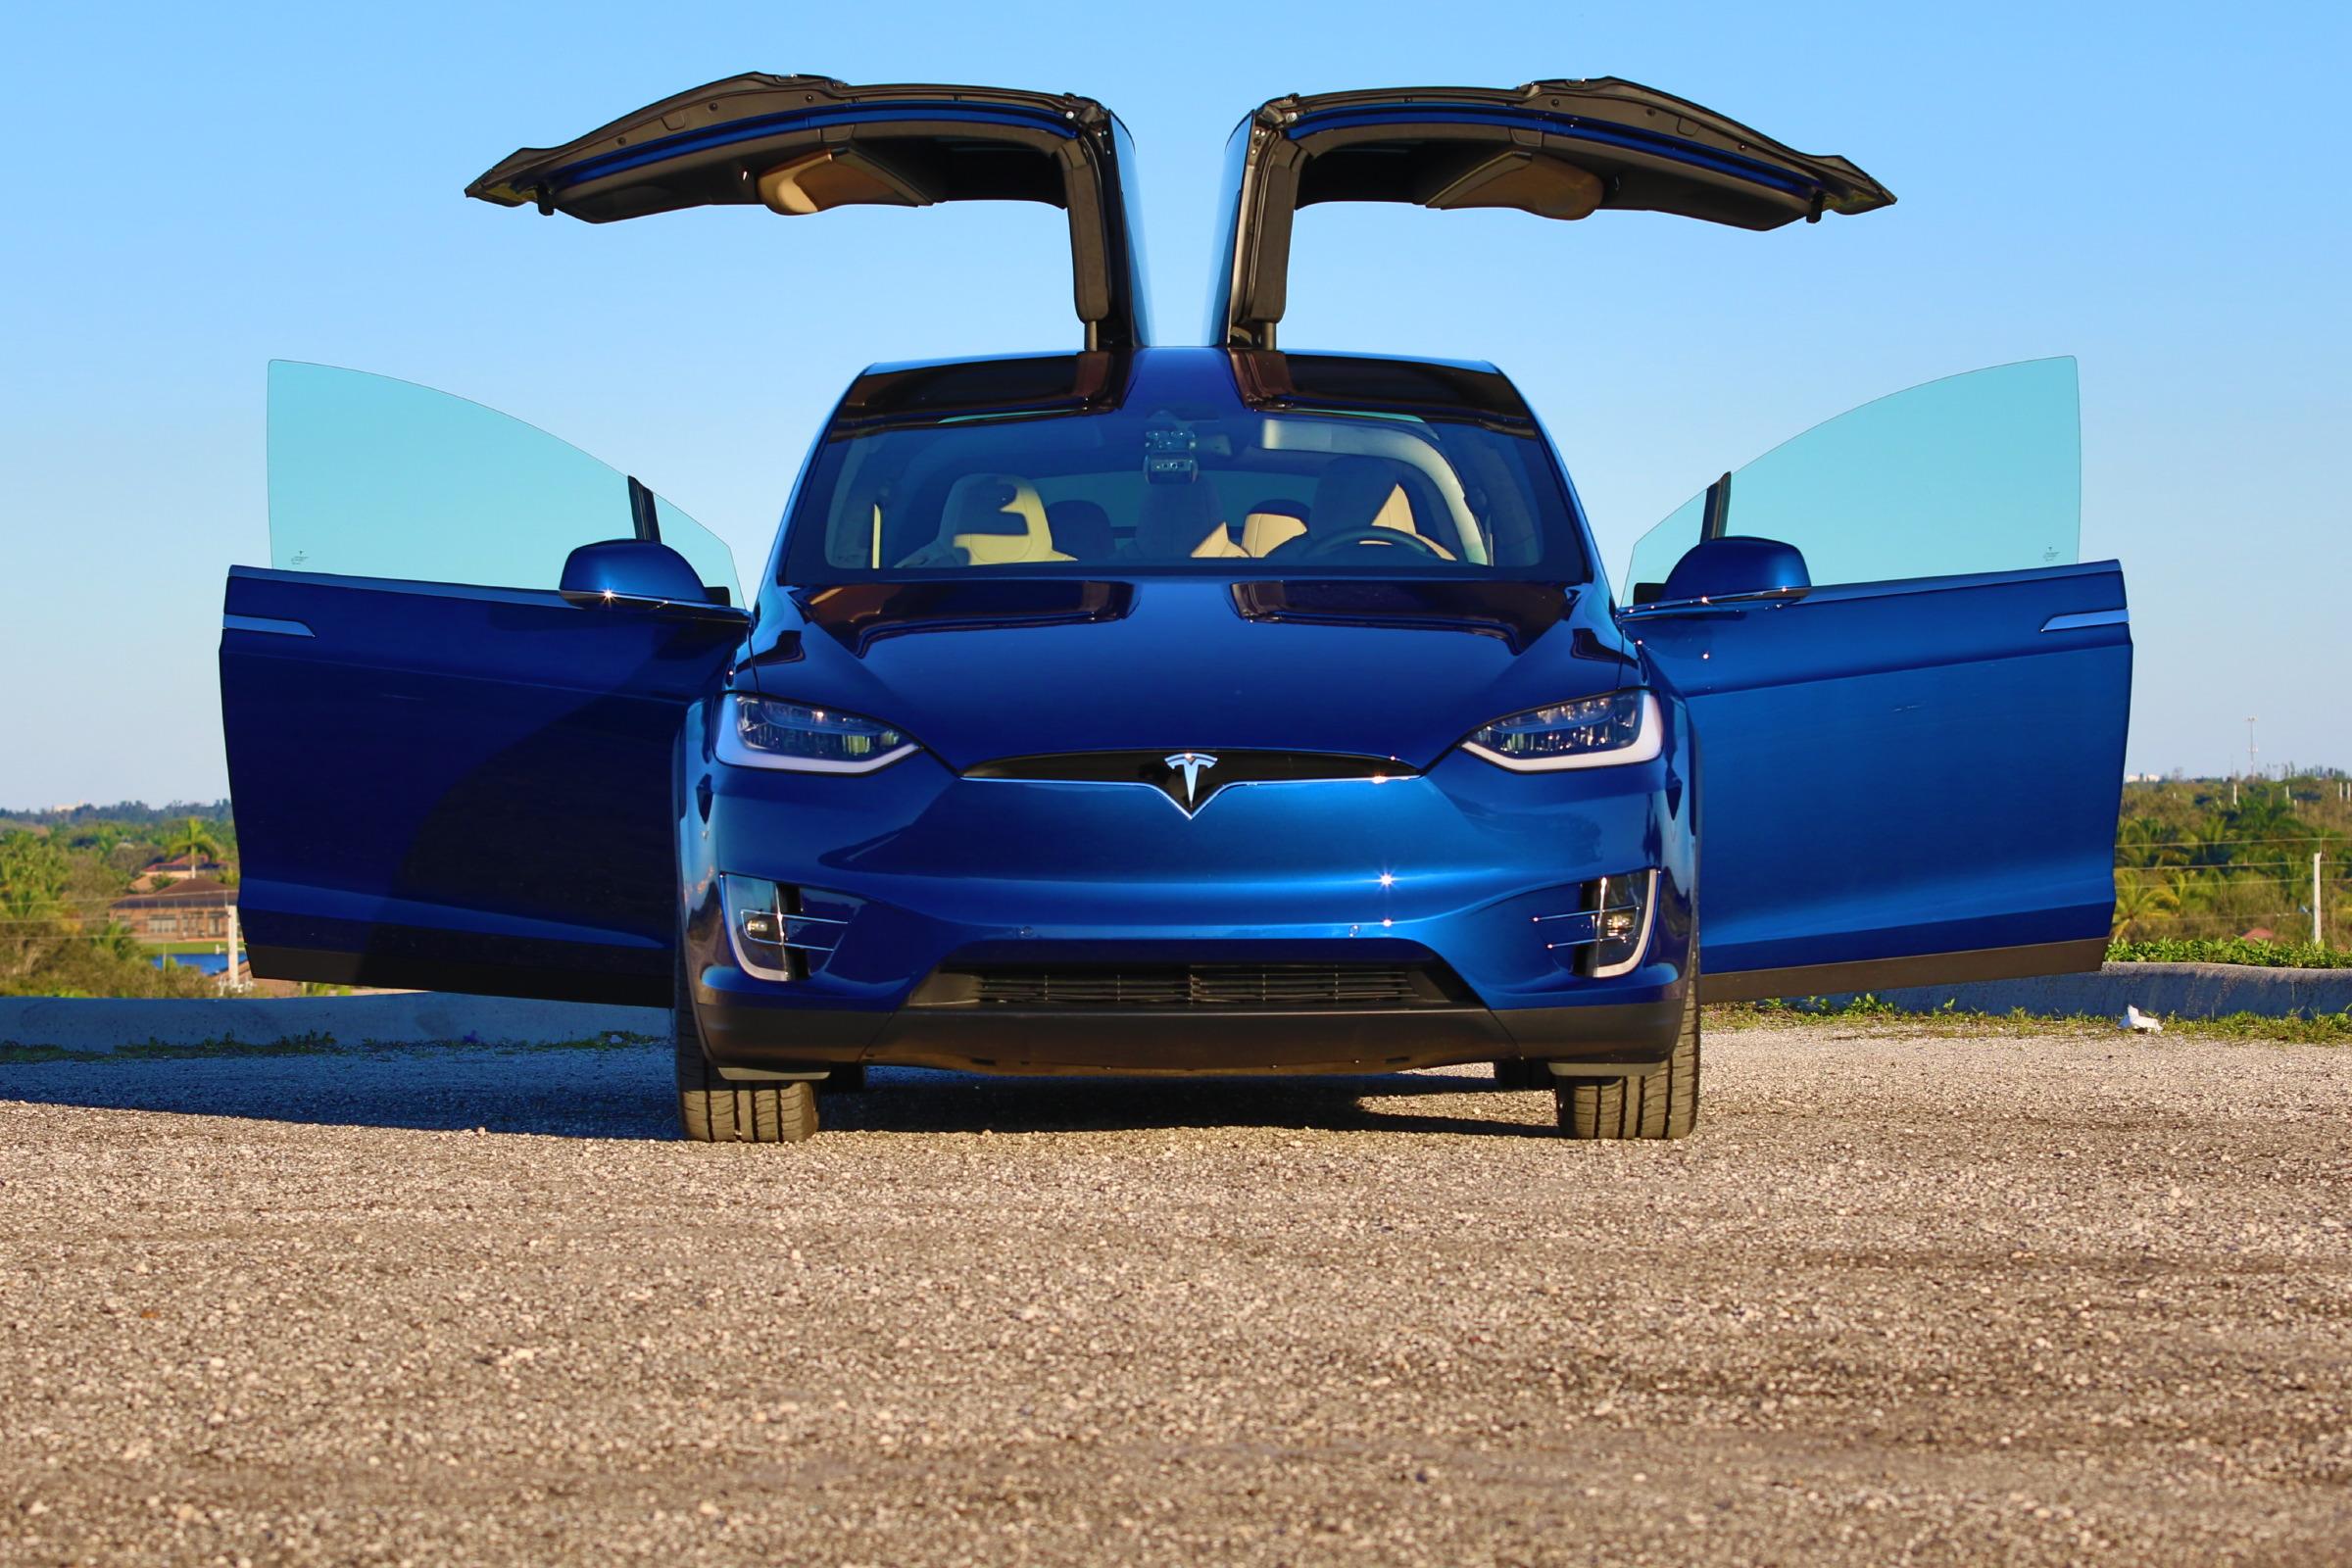 Mustang 0 60 >> 2016 Tesla Model X P90D Deep Blue Metallic Picture Gallery   DragTimes.com Drag Racing, Fast ...